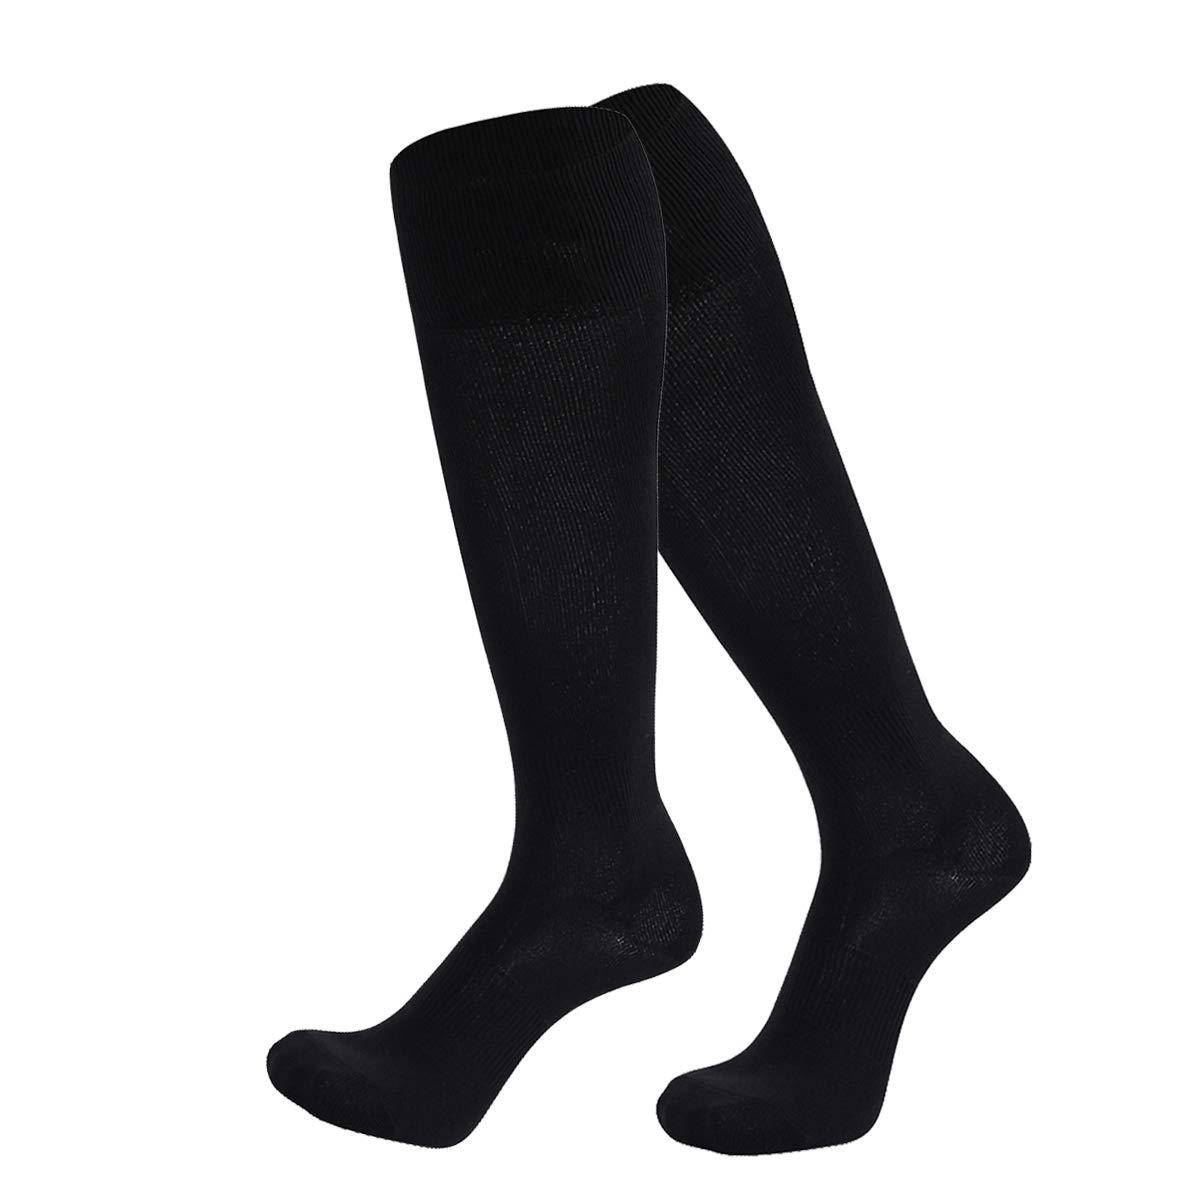 Dsource Unisex Soccer Socks Knee High Solid Baseball Football Sports Team Socks 2 Pairs Black by Dsource